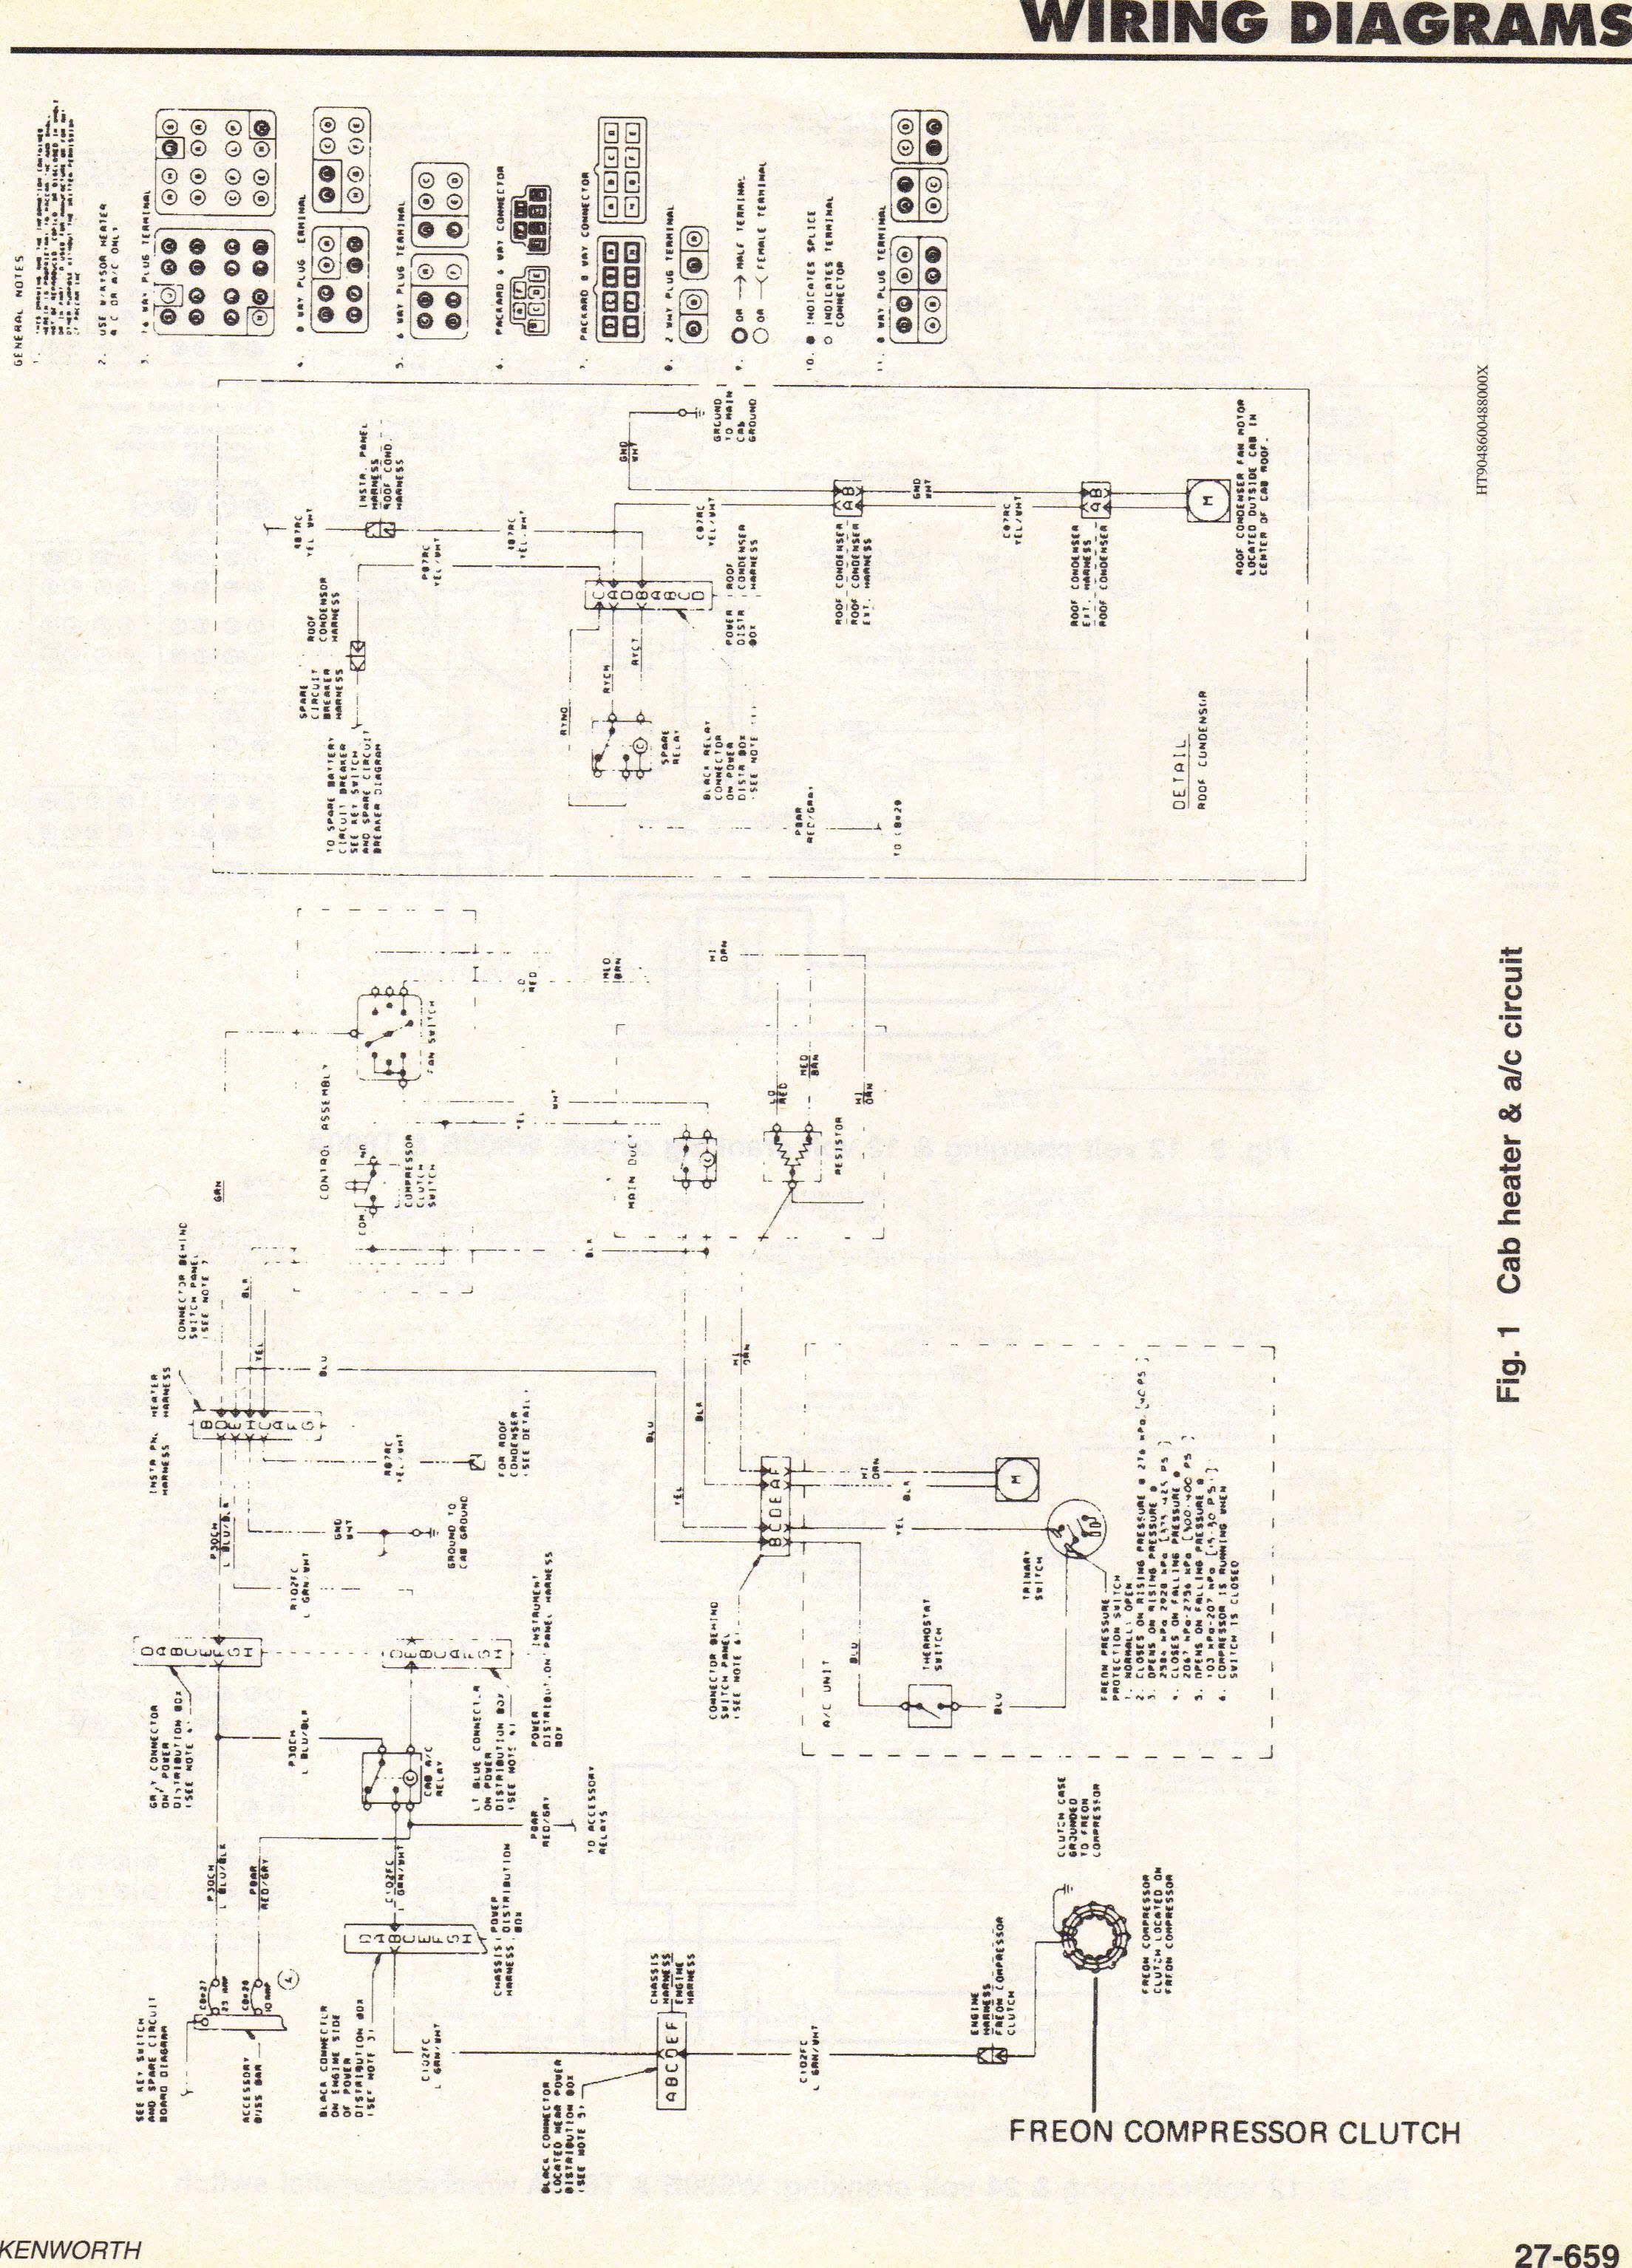 images?q=tbn:ANd9GcQh_l3eQ5xwiPy07kGEXjmjgmBKBRB7H2mRxCGhv1tFWg5c_mWT Location Kenworth T680 Fuse Panel Diagram